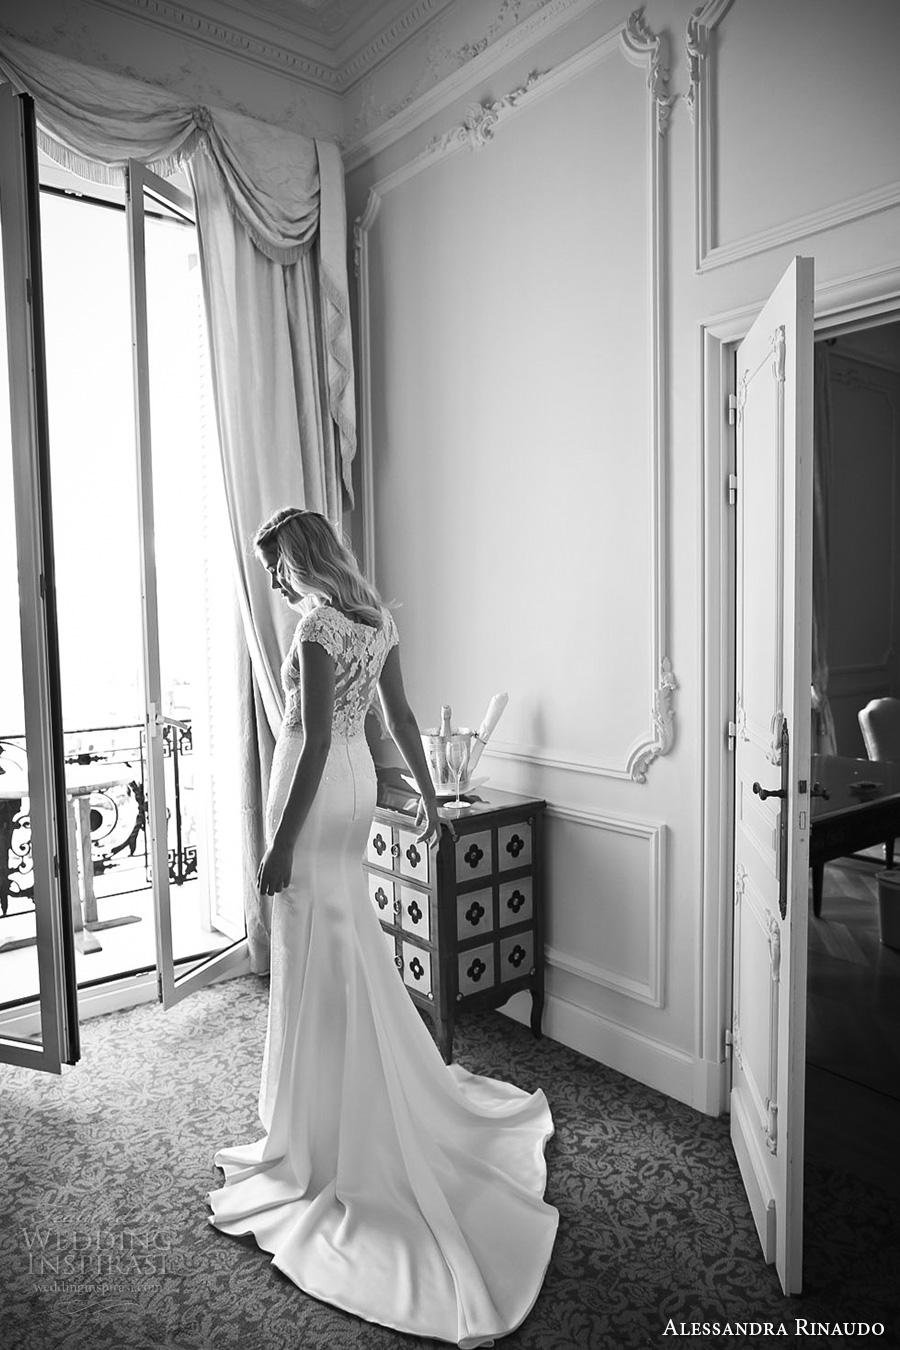 alessandra rinaudo 2017 bridal cap sleeves boat neckline lace bodice heavily embellished bodice satin skirt elegant sheath wedding dress lace back chapel train (18) bv